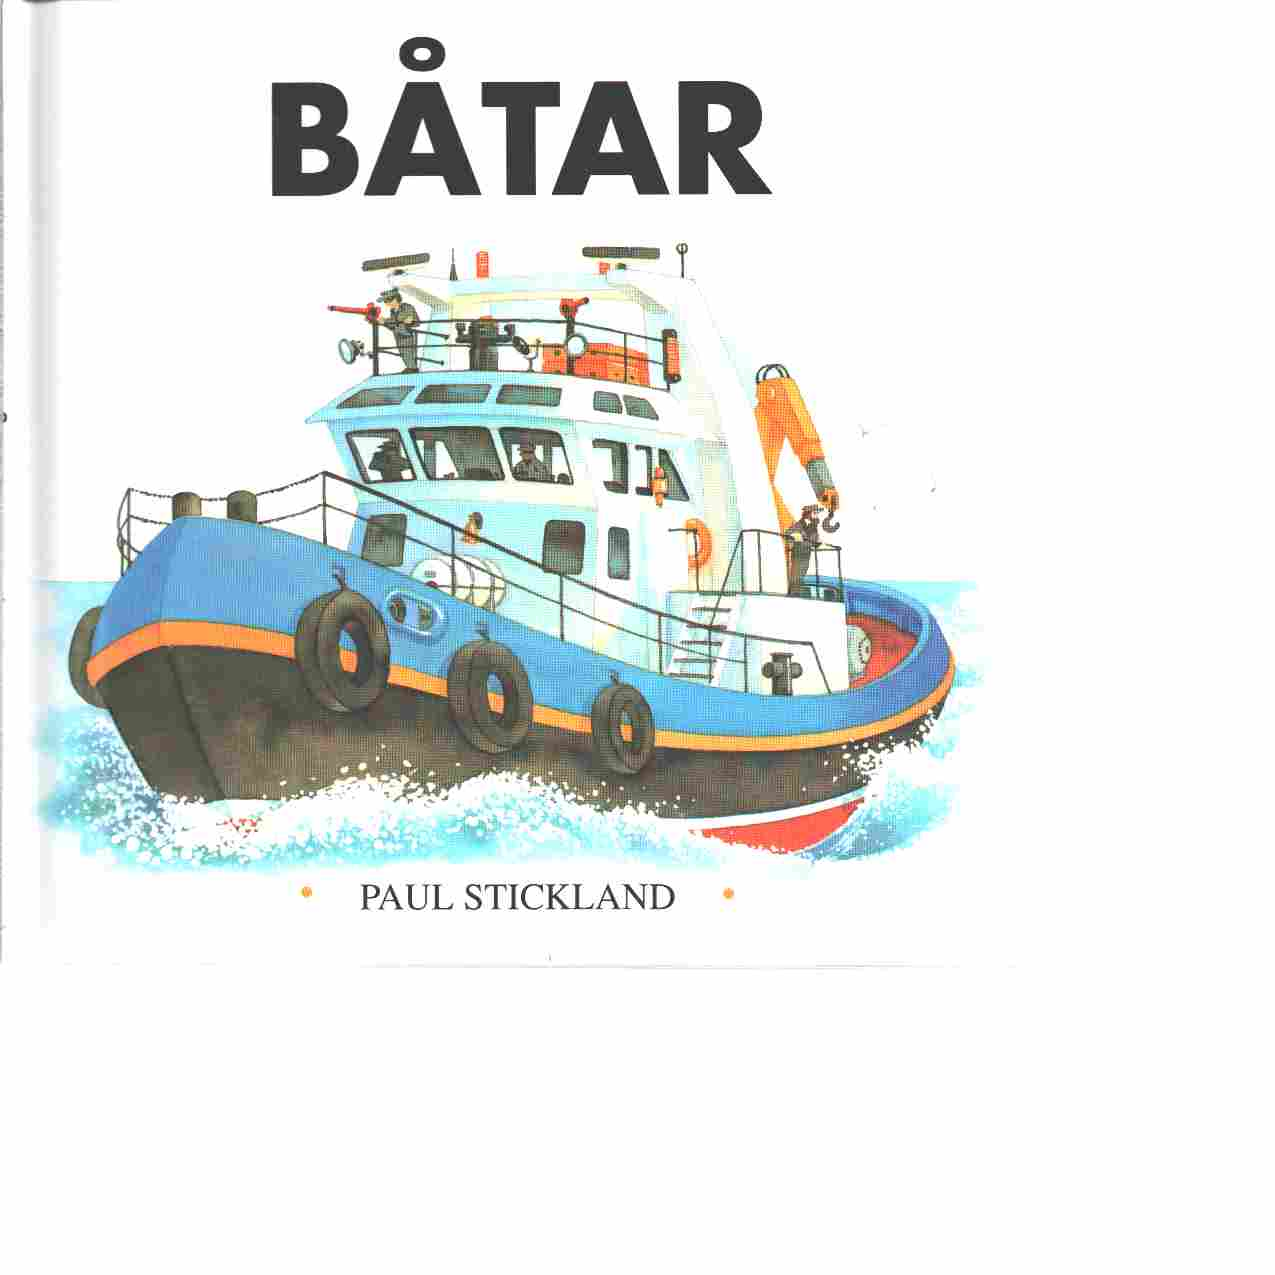 Båtar - Stickland, Paul  och Johansson, George